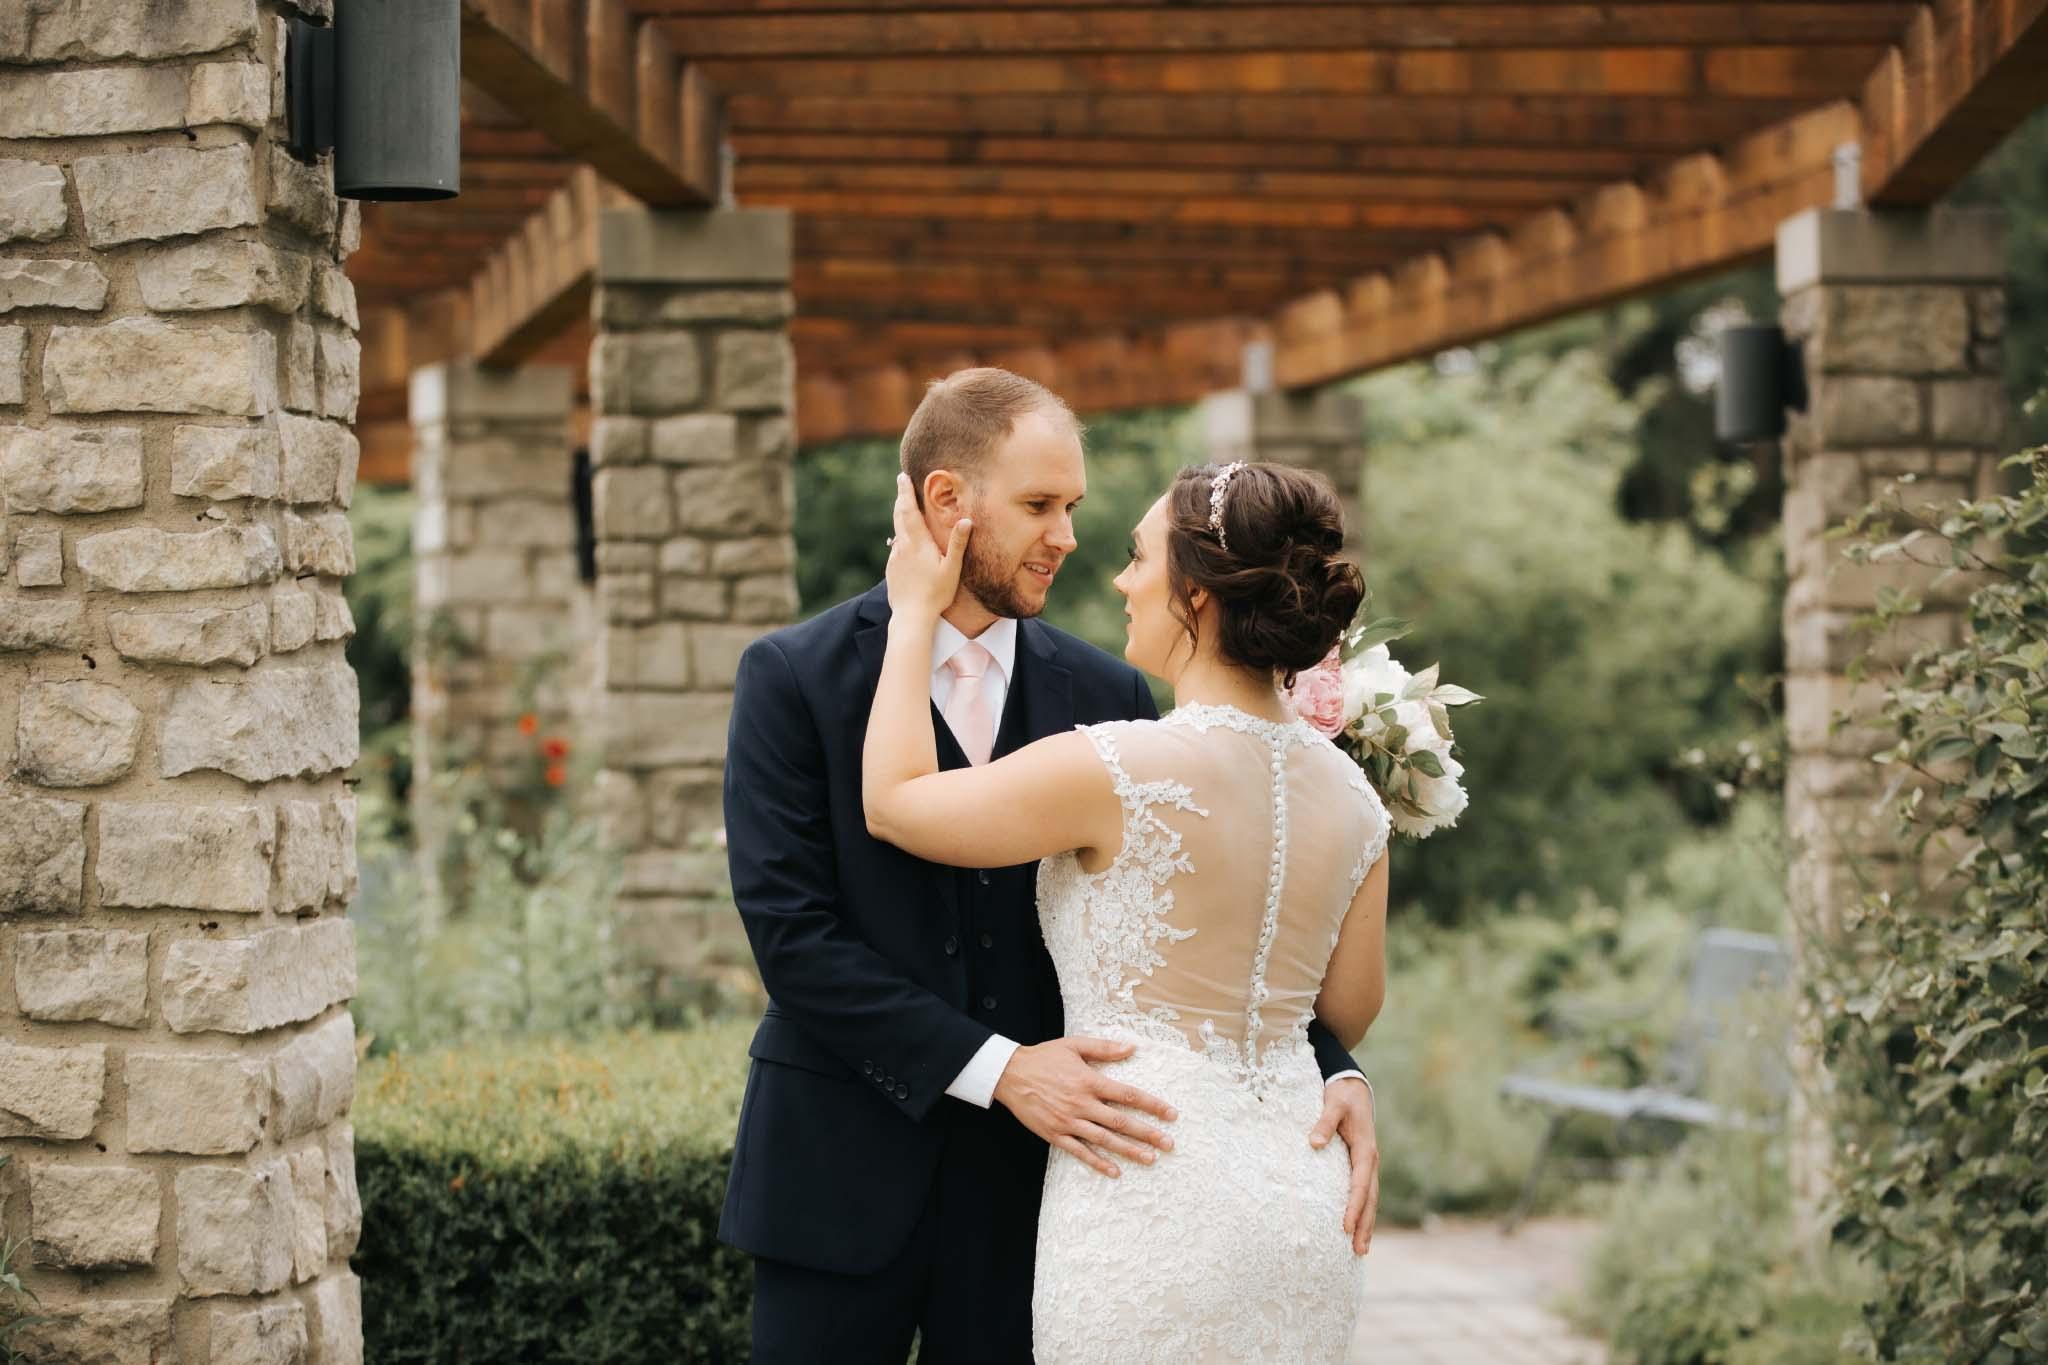 Wegerzyn Gardens, Photo session, Wedding, Outdoor, Bride and Groom, Dayton, Ohio, Photography, Photographer,